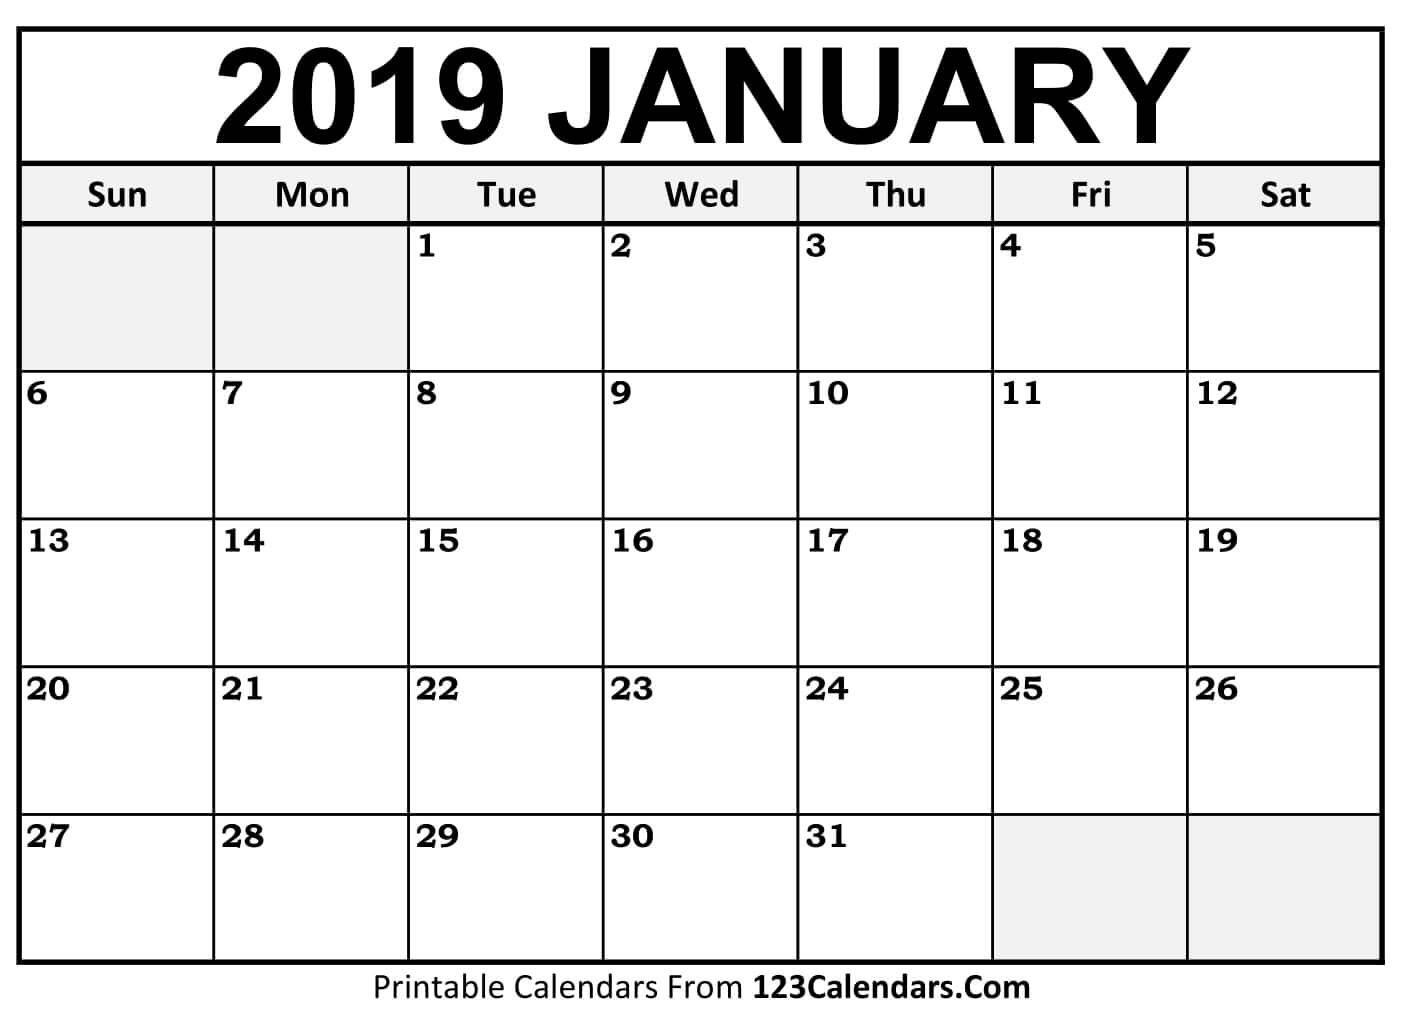 Printable January 2019 Calendar Templates – 123Calendars Calendar 2019 January